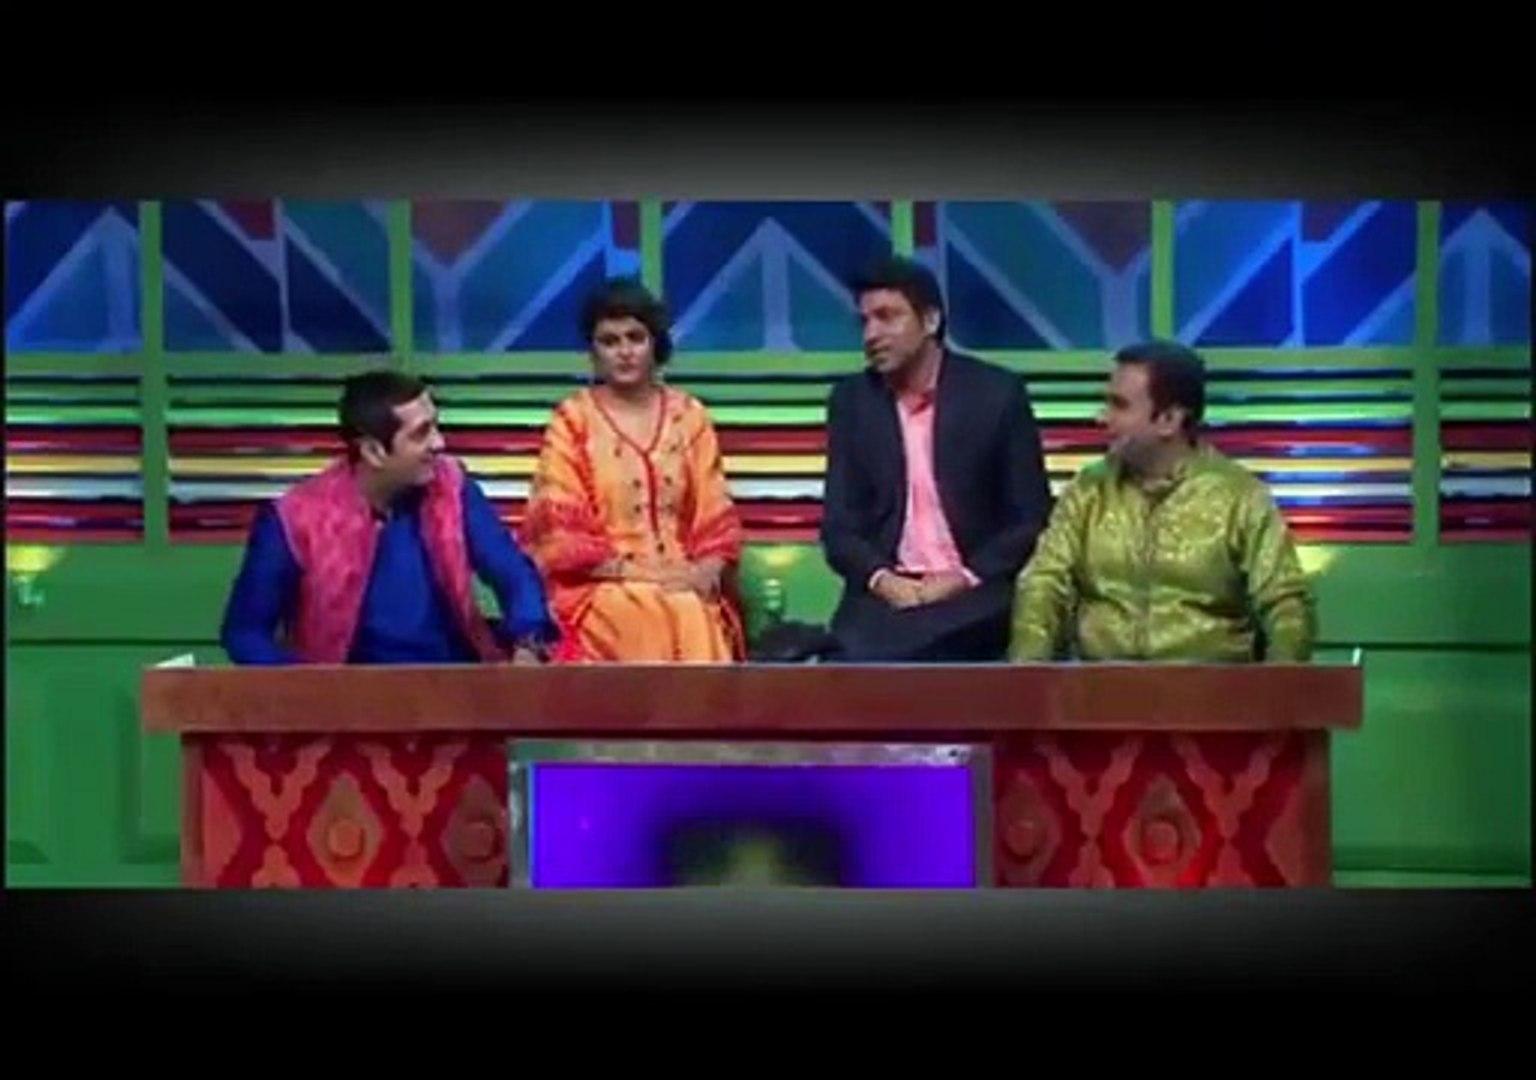 Zafri Khan And Rj Naved Comedy In Shoaib Akhtar Comedy Show India Best New 2016